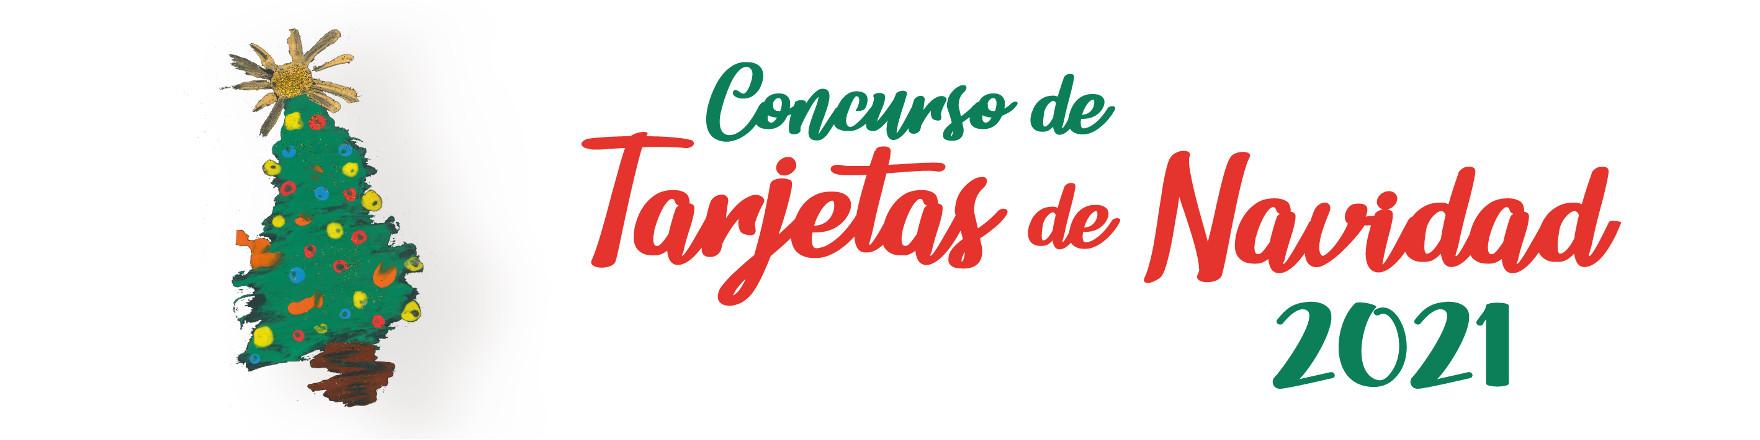 cabecera concursotarjetasnavidad21